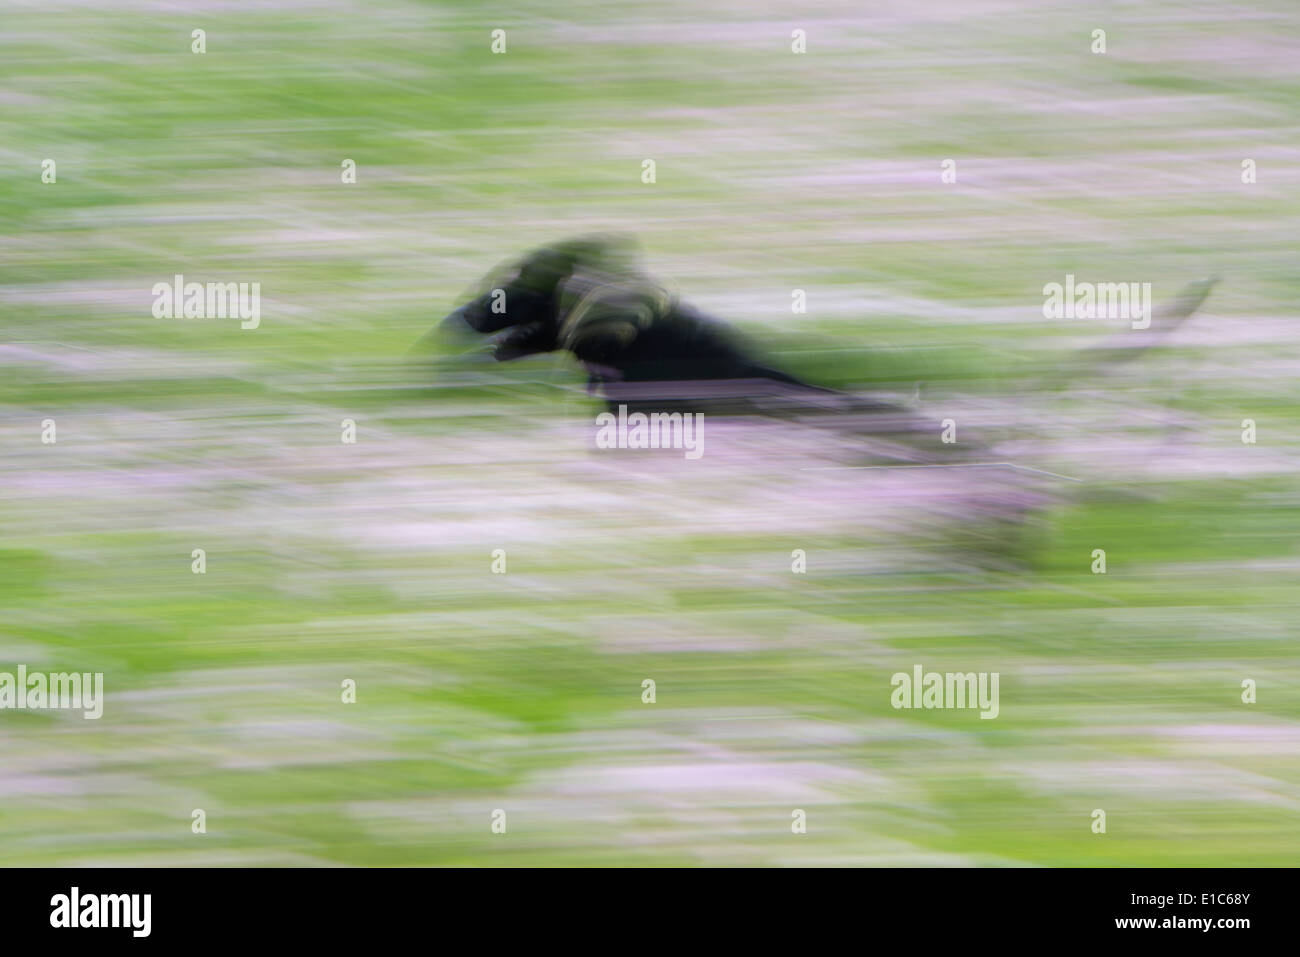 A black labrador dog running through a wildflower meadow. - Stock Image